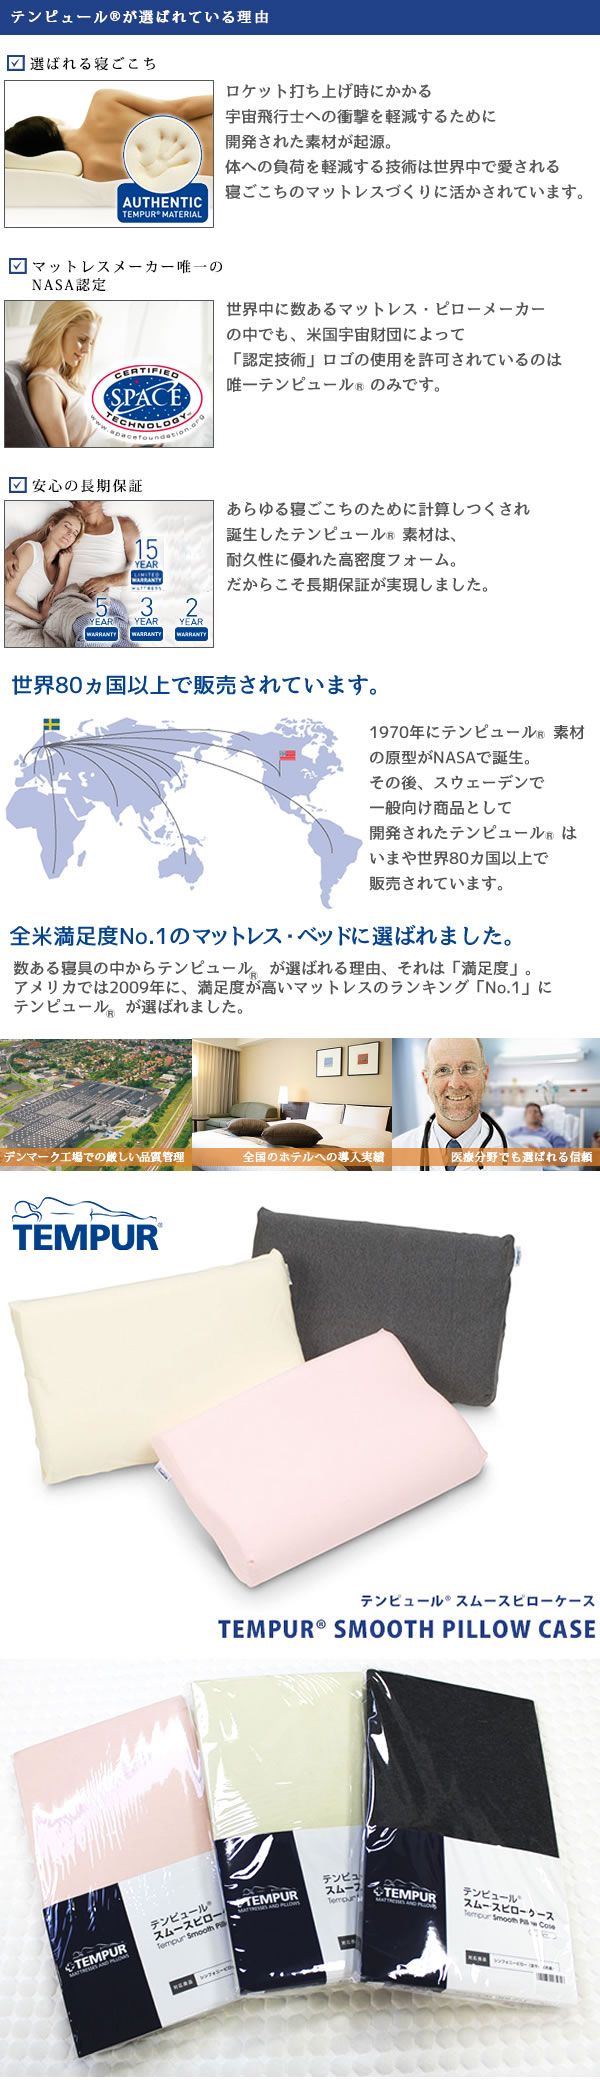 TEMPUR テンピュール スムースピロケース(トラディショナルピロー・ブリーズピロー対応)